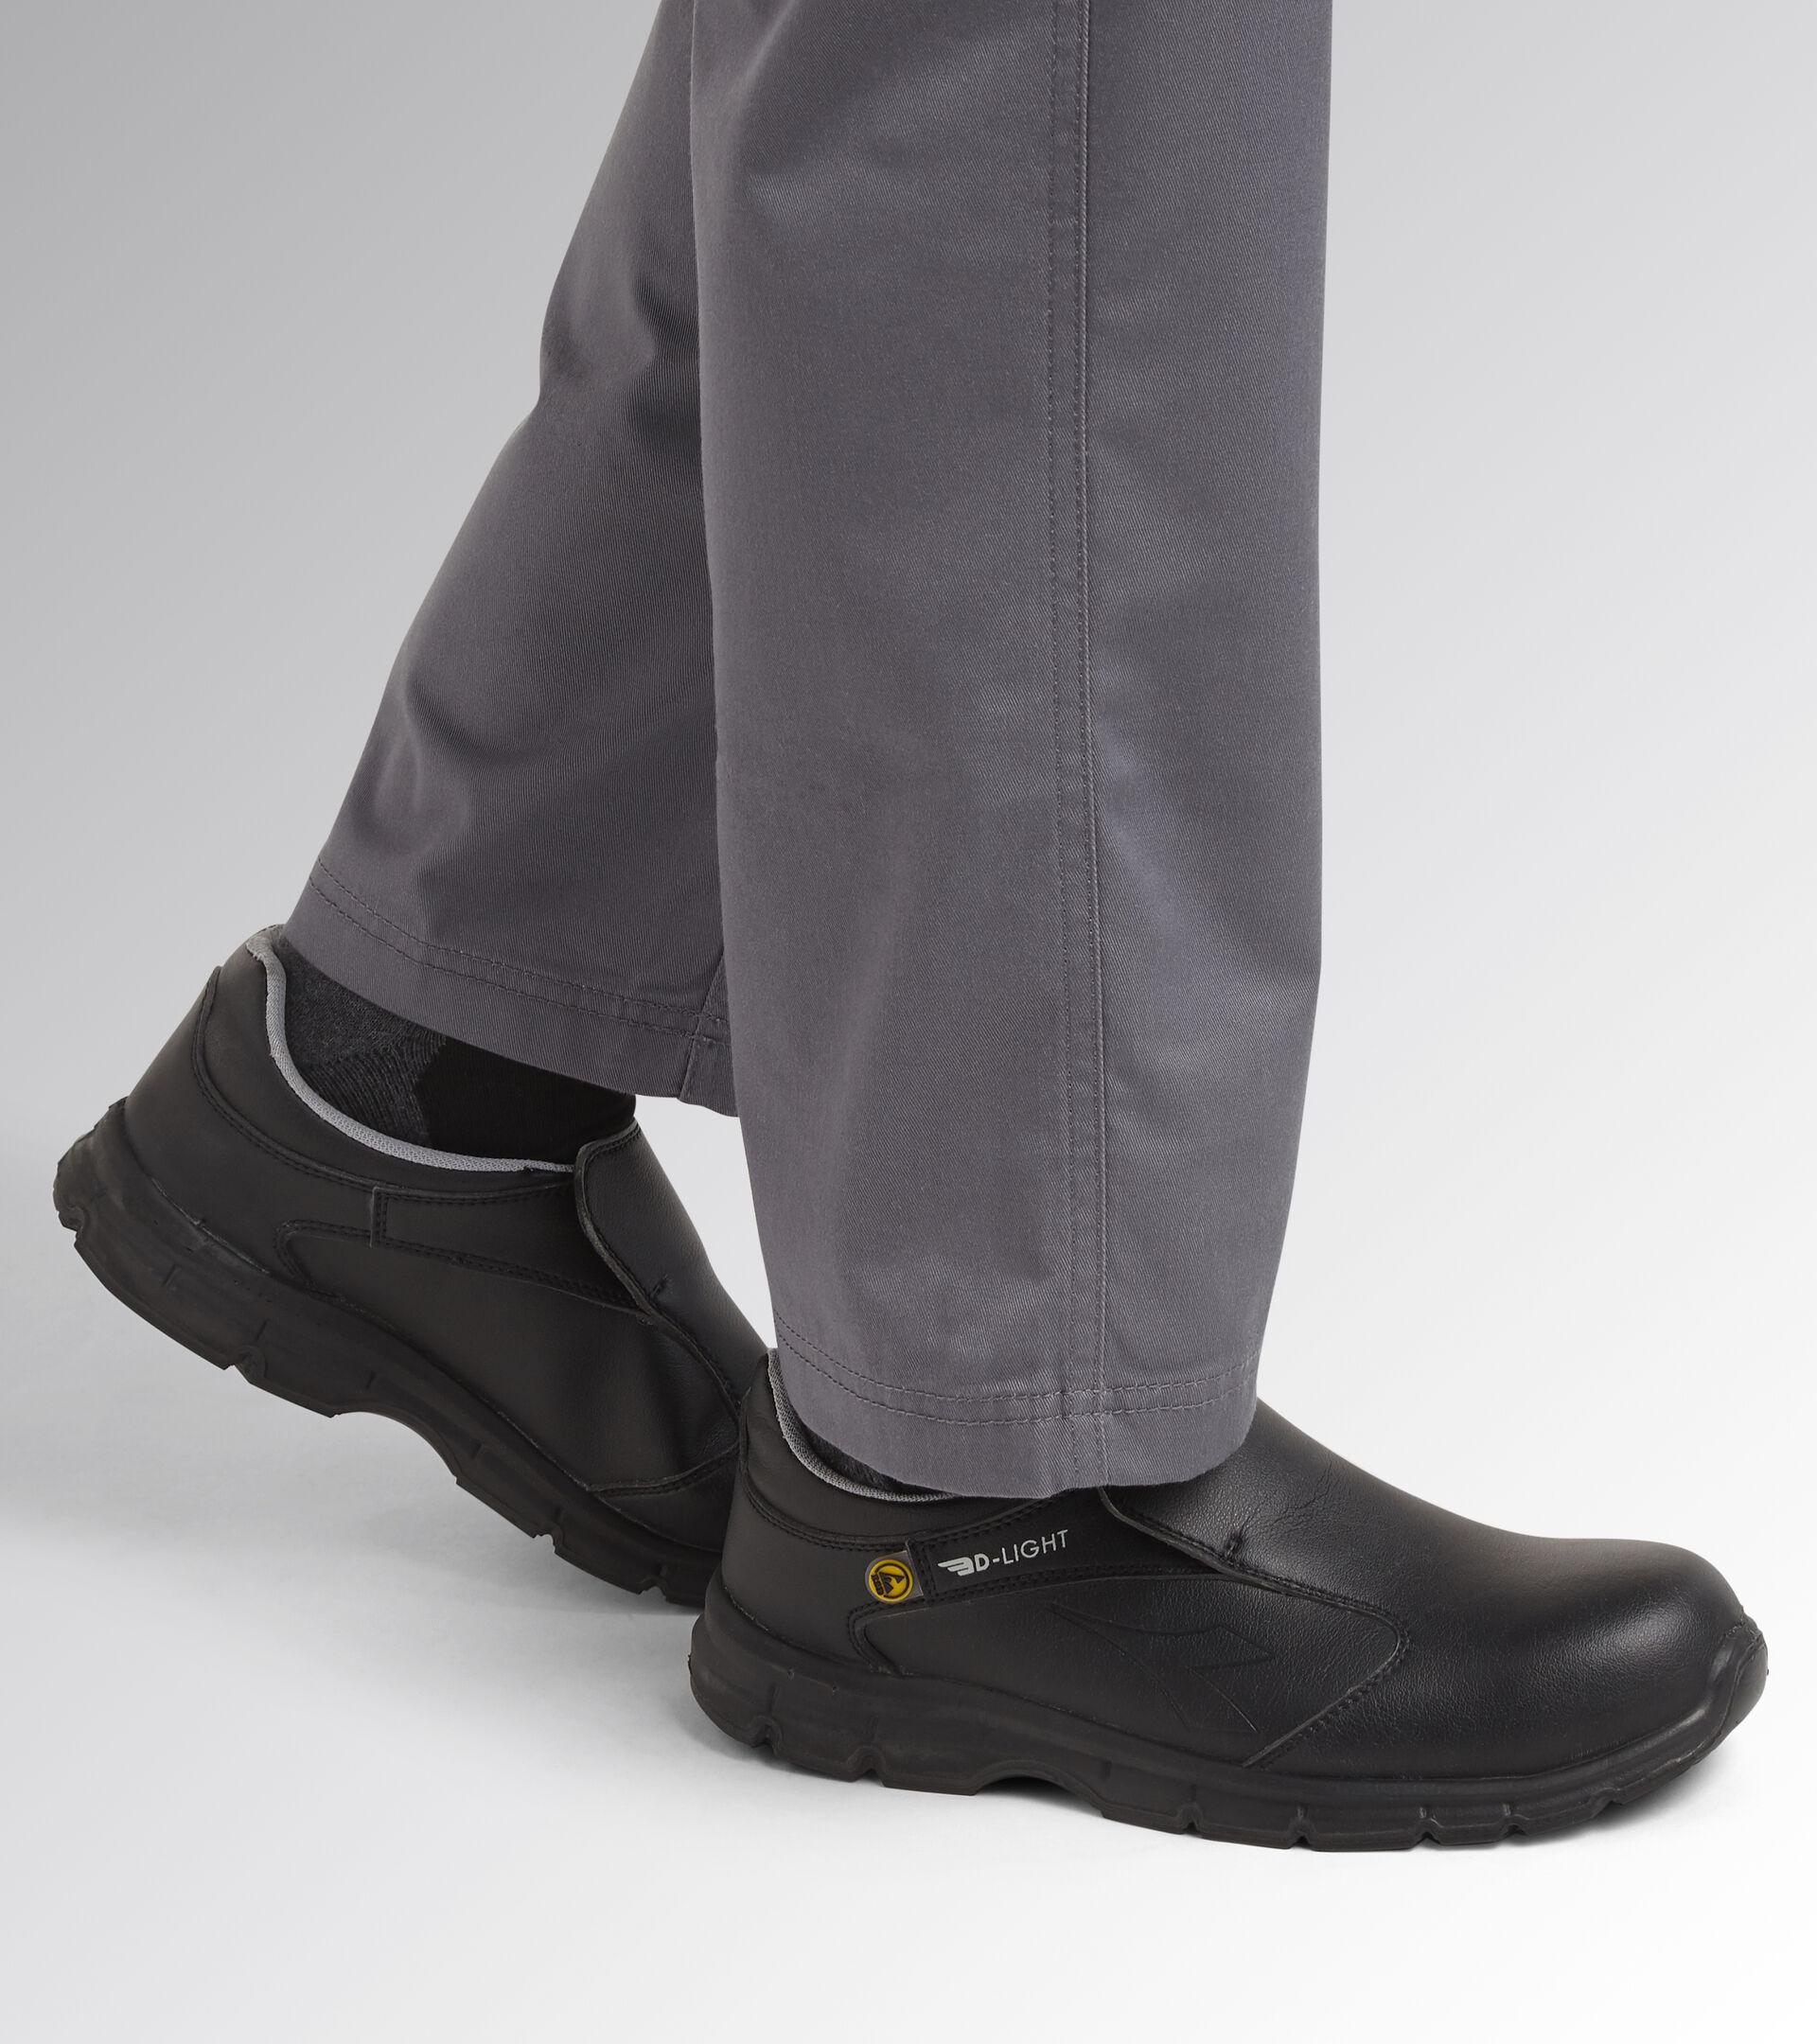 Footwear Utility UNISEX RUN MICRO LOW S2 SRC ESD BLACK Utility